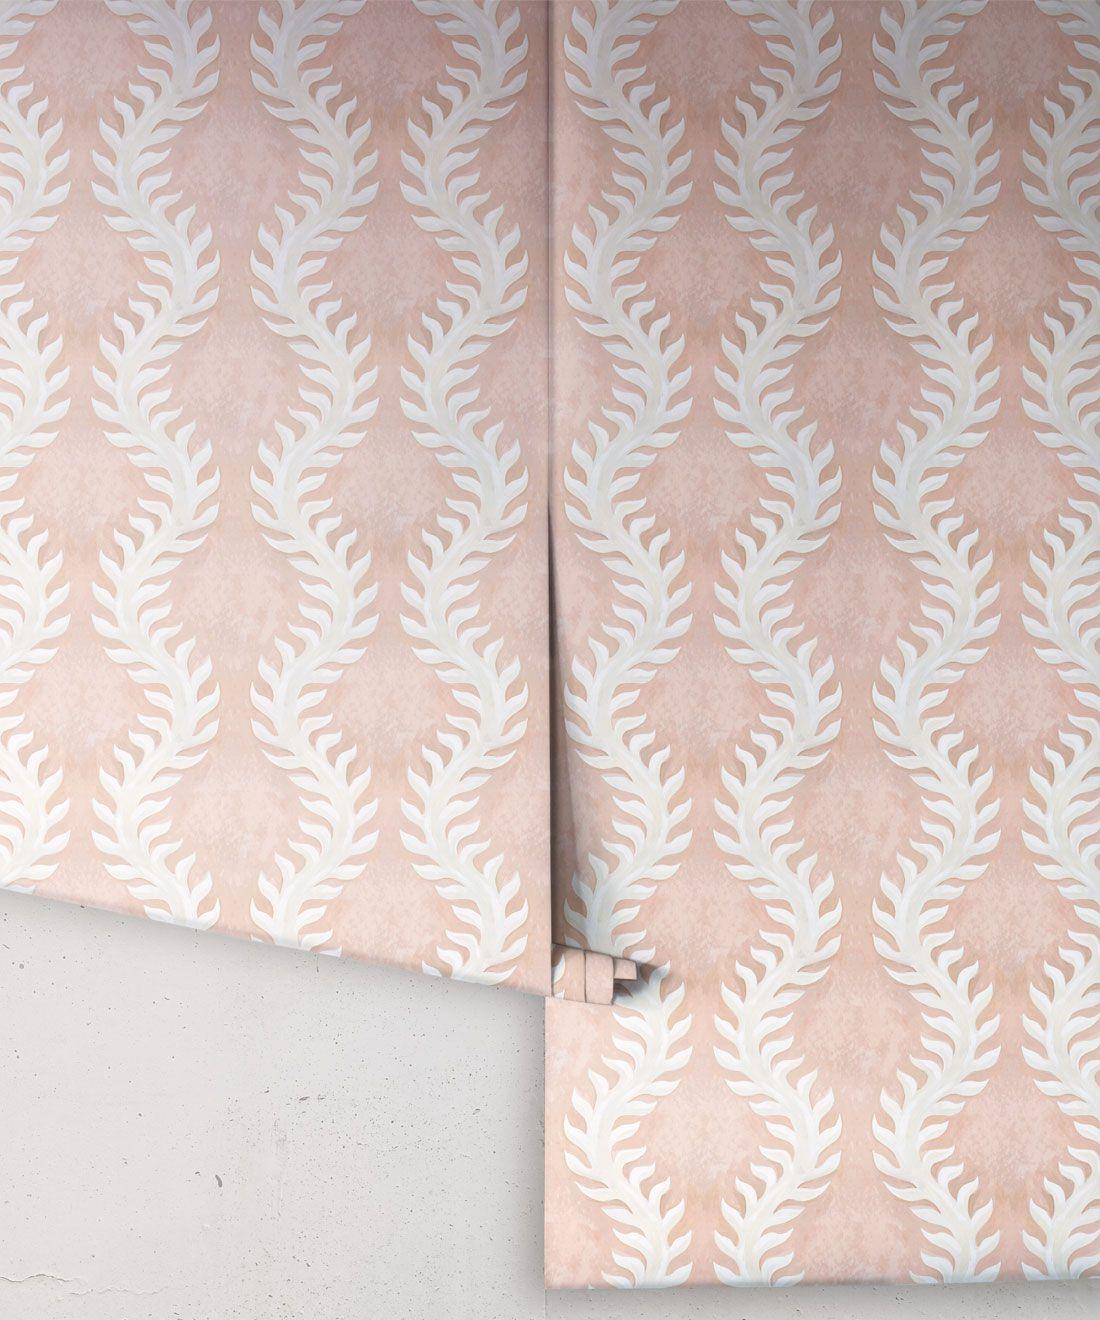 Fern Wallpaper • Pink Wallpaper •Rolls